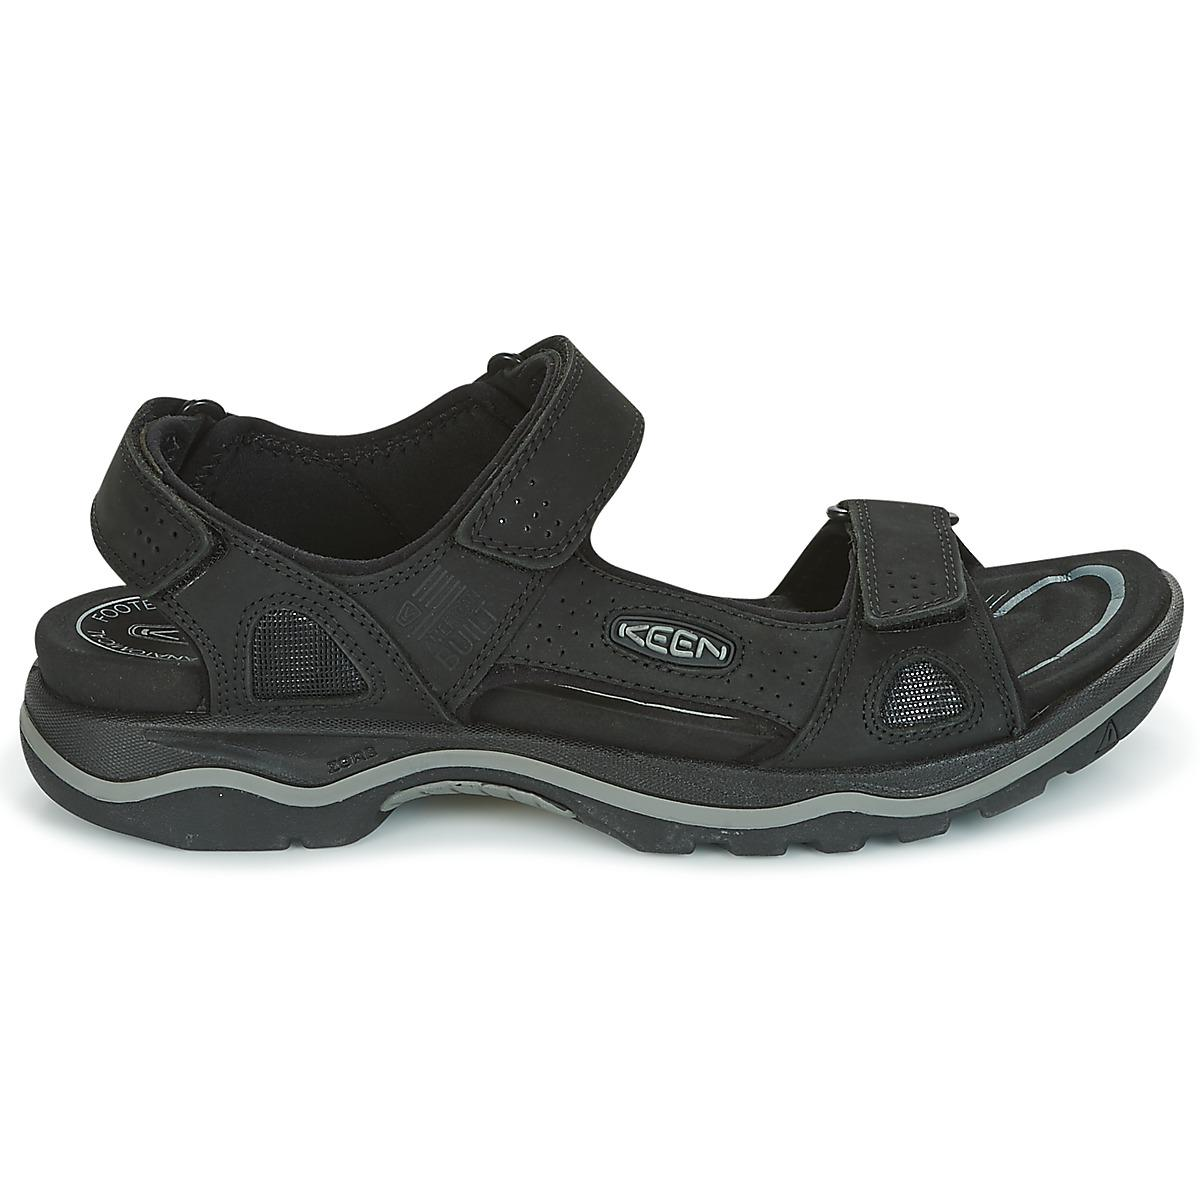 48de88234036 Keen Rialto 3 Point Men s Sandals In Black in Black for Men - Lyst